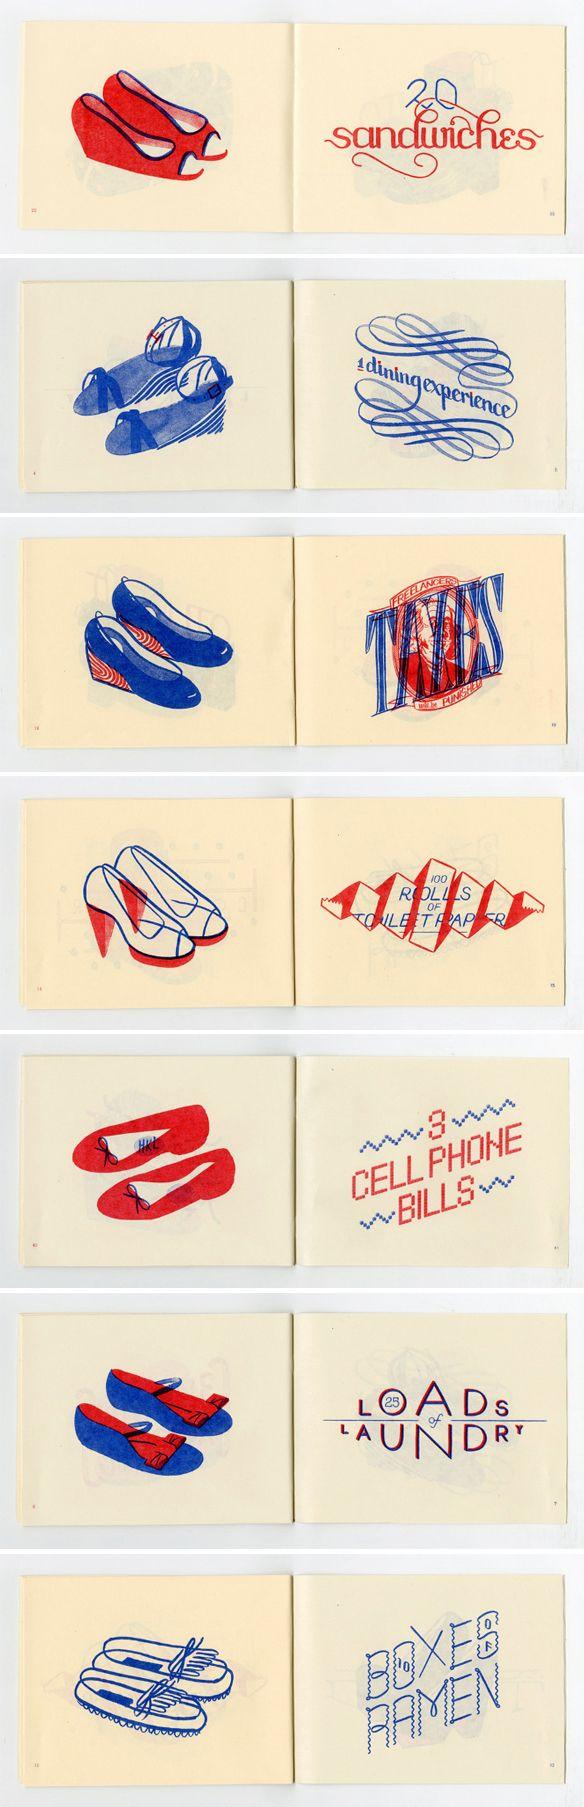 "hannah k. lee - a gorgeous little zine titled ""shoes over bills"""